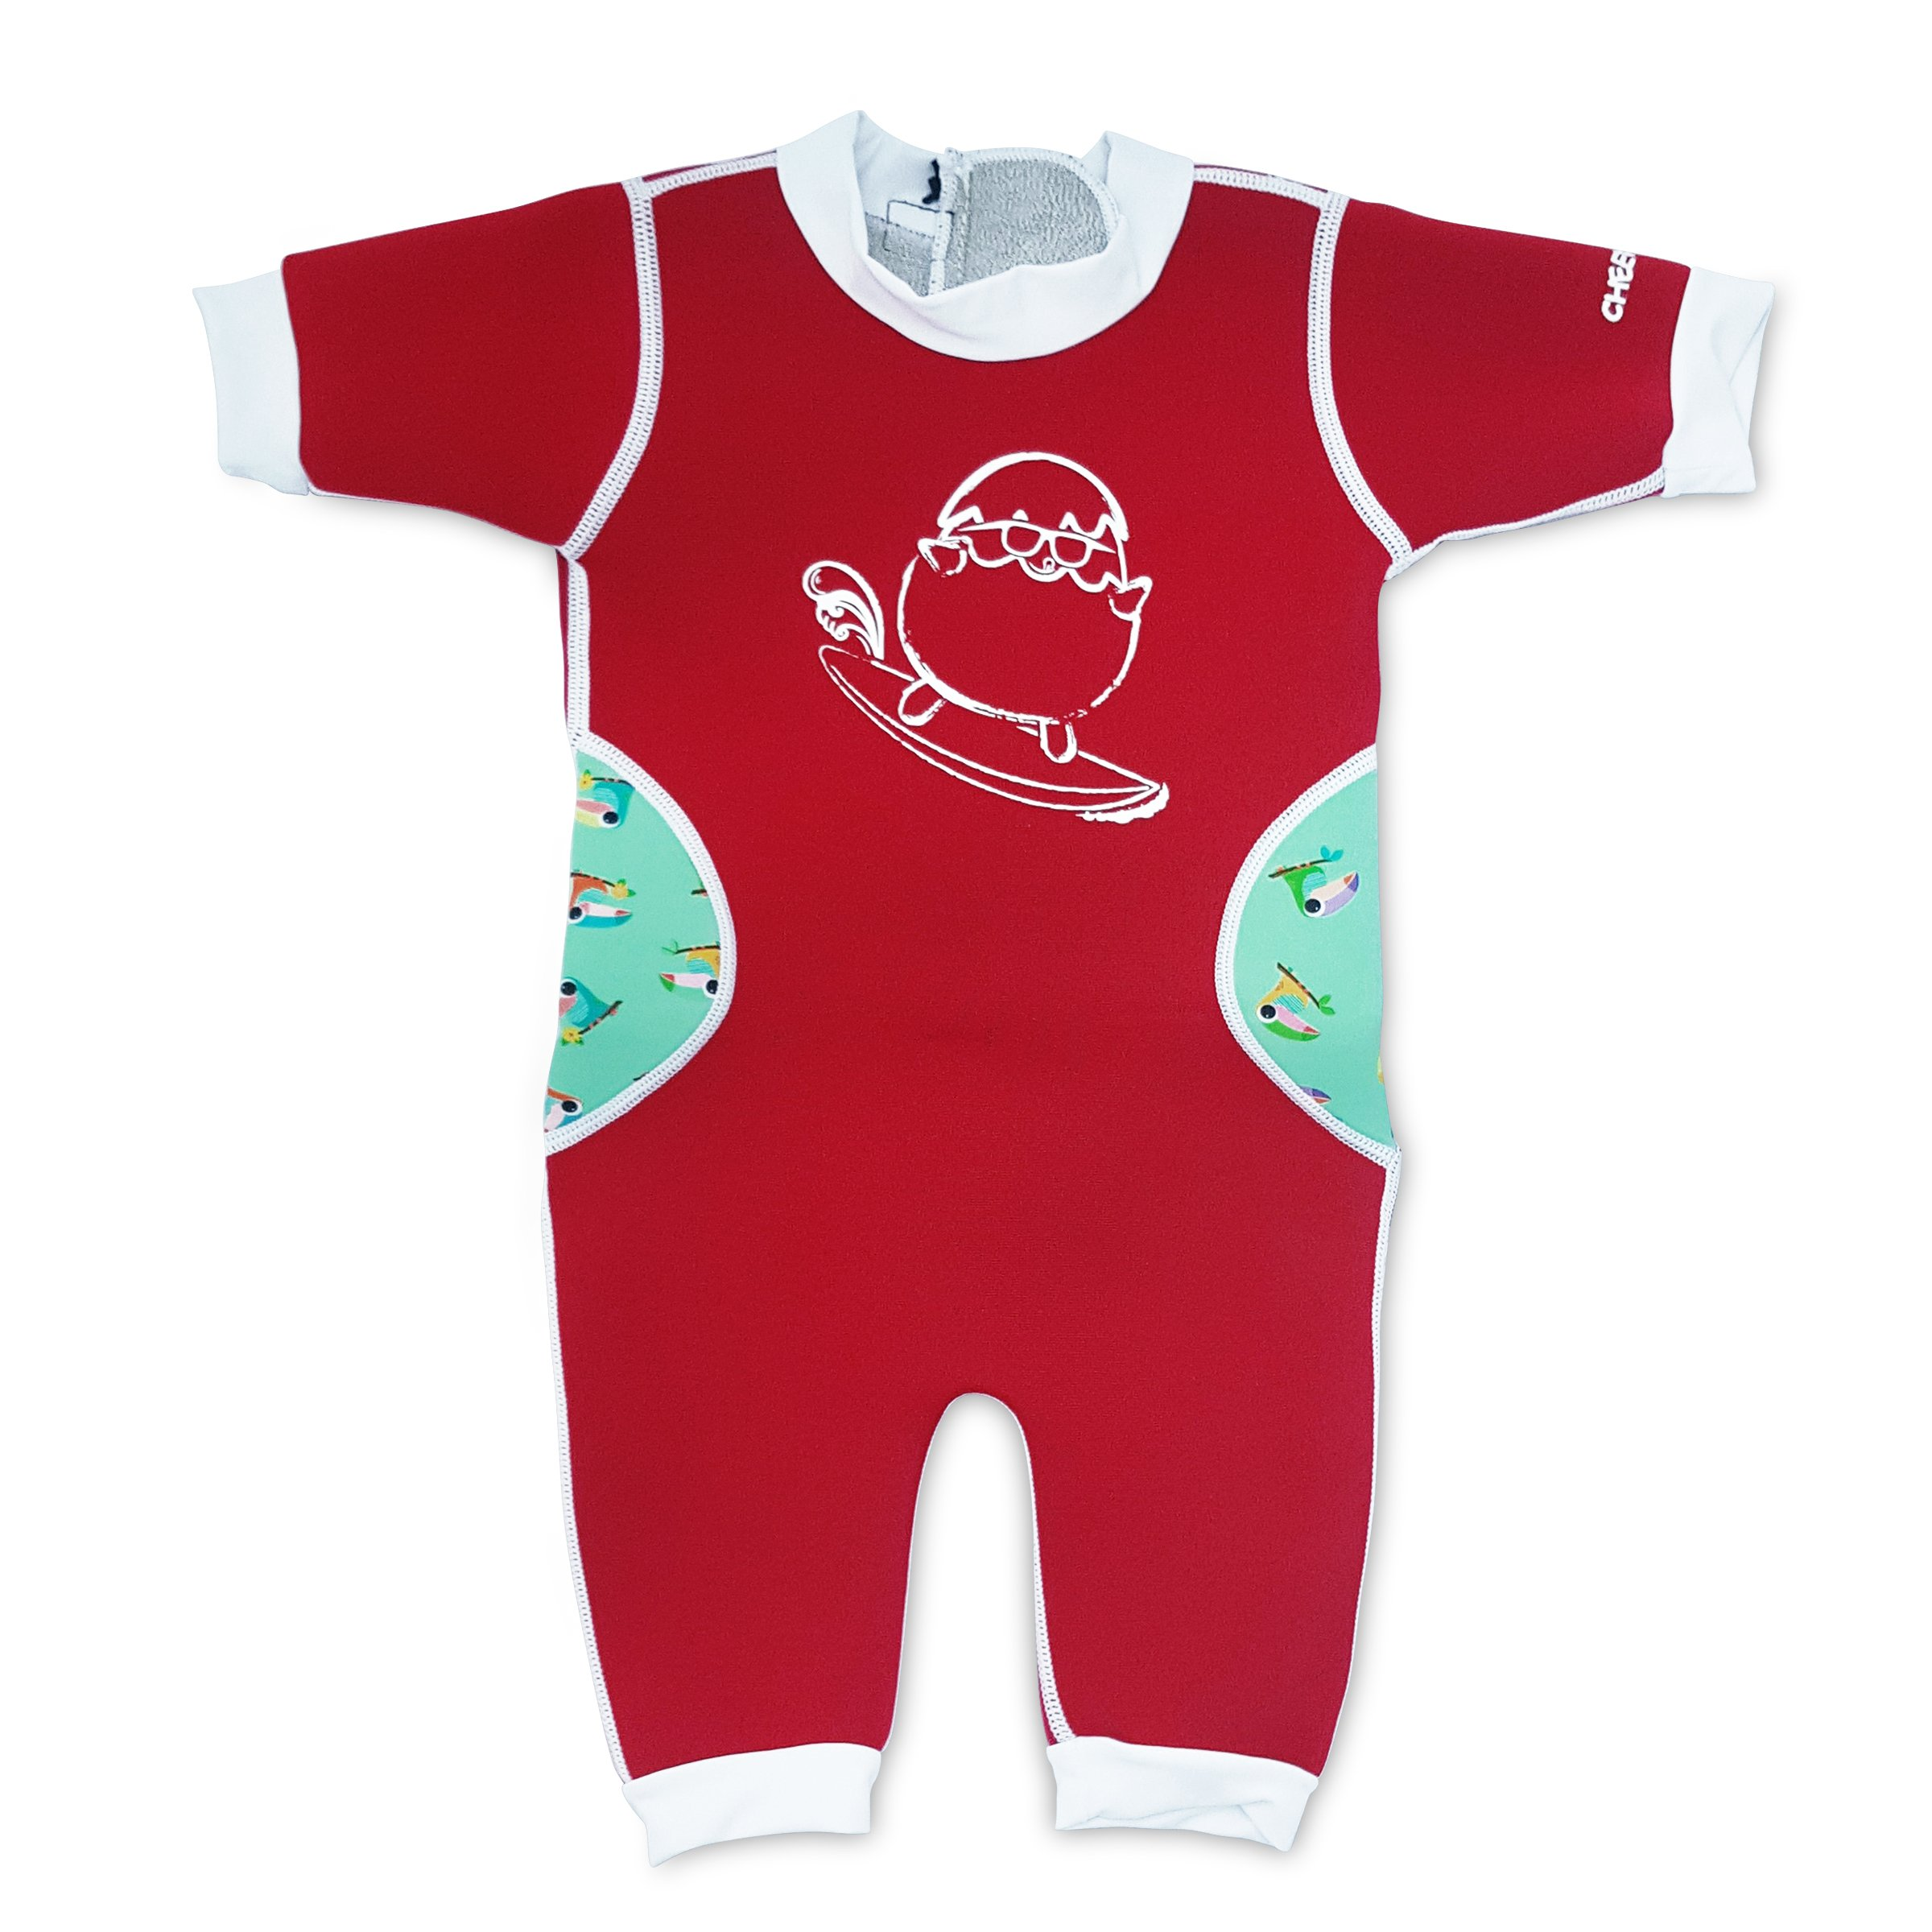 Warmiebabes-Baby, Toddler Thermal One Piece Kid